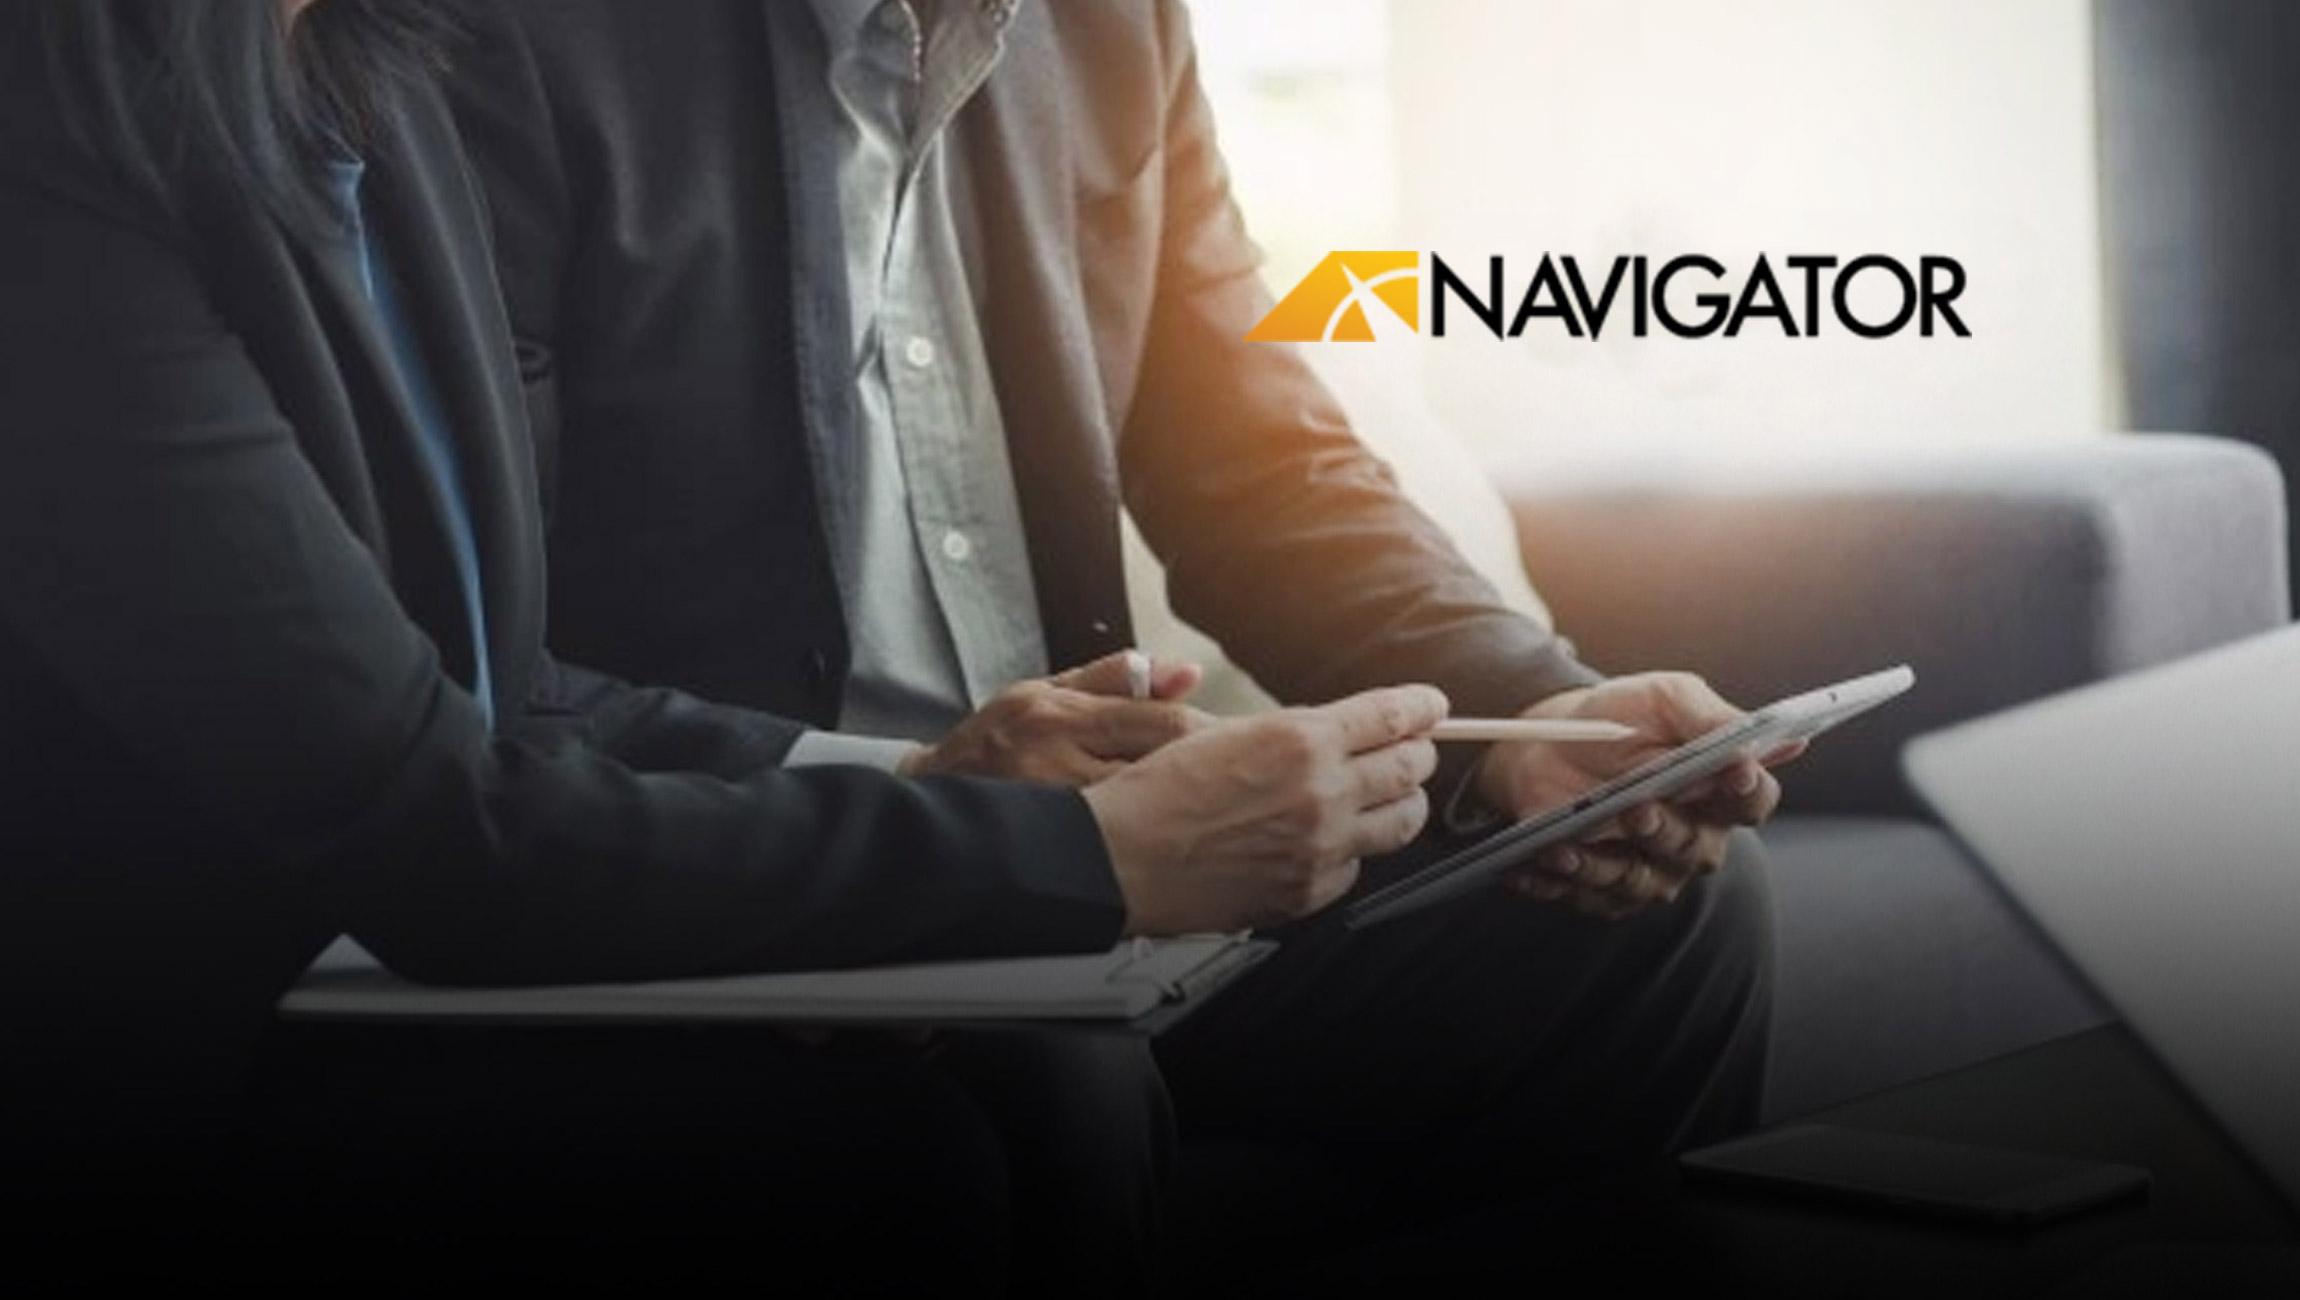 Navigator-Business-Solutions-Announces-Leadership-Transition